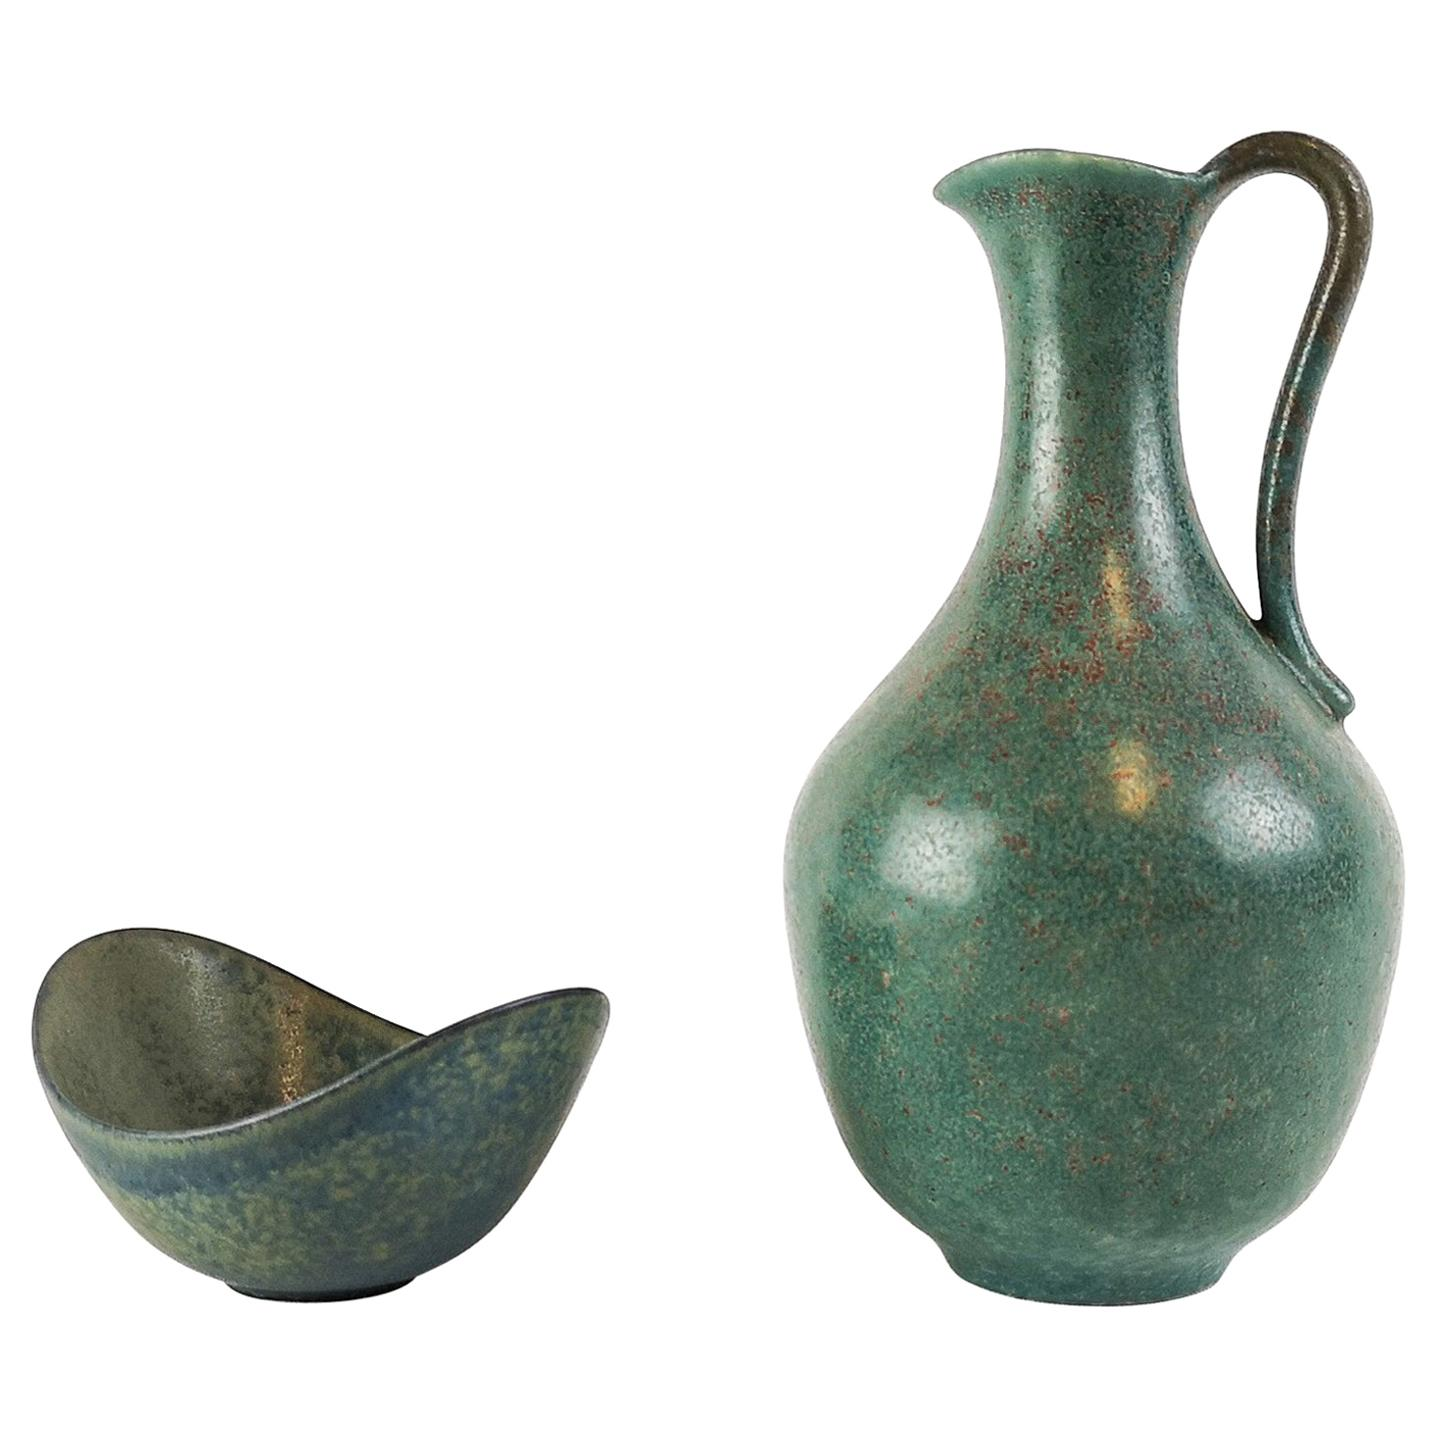 Set of 2 Gunnar Nylund Ceramic Pieces Midcentury Sweden Rörstrand